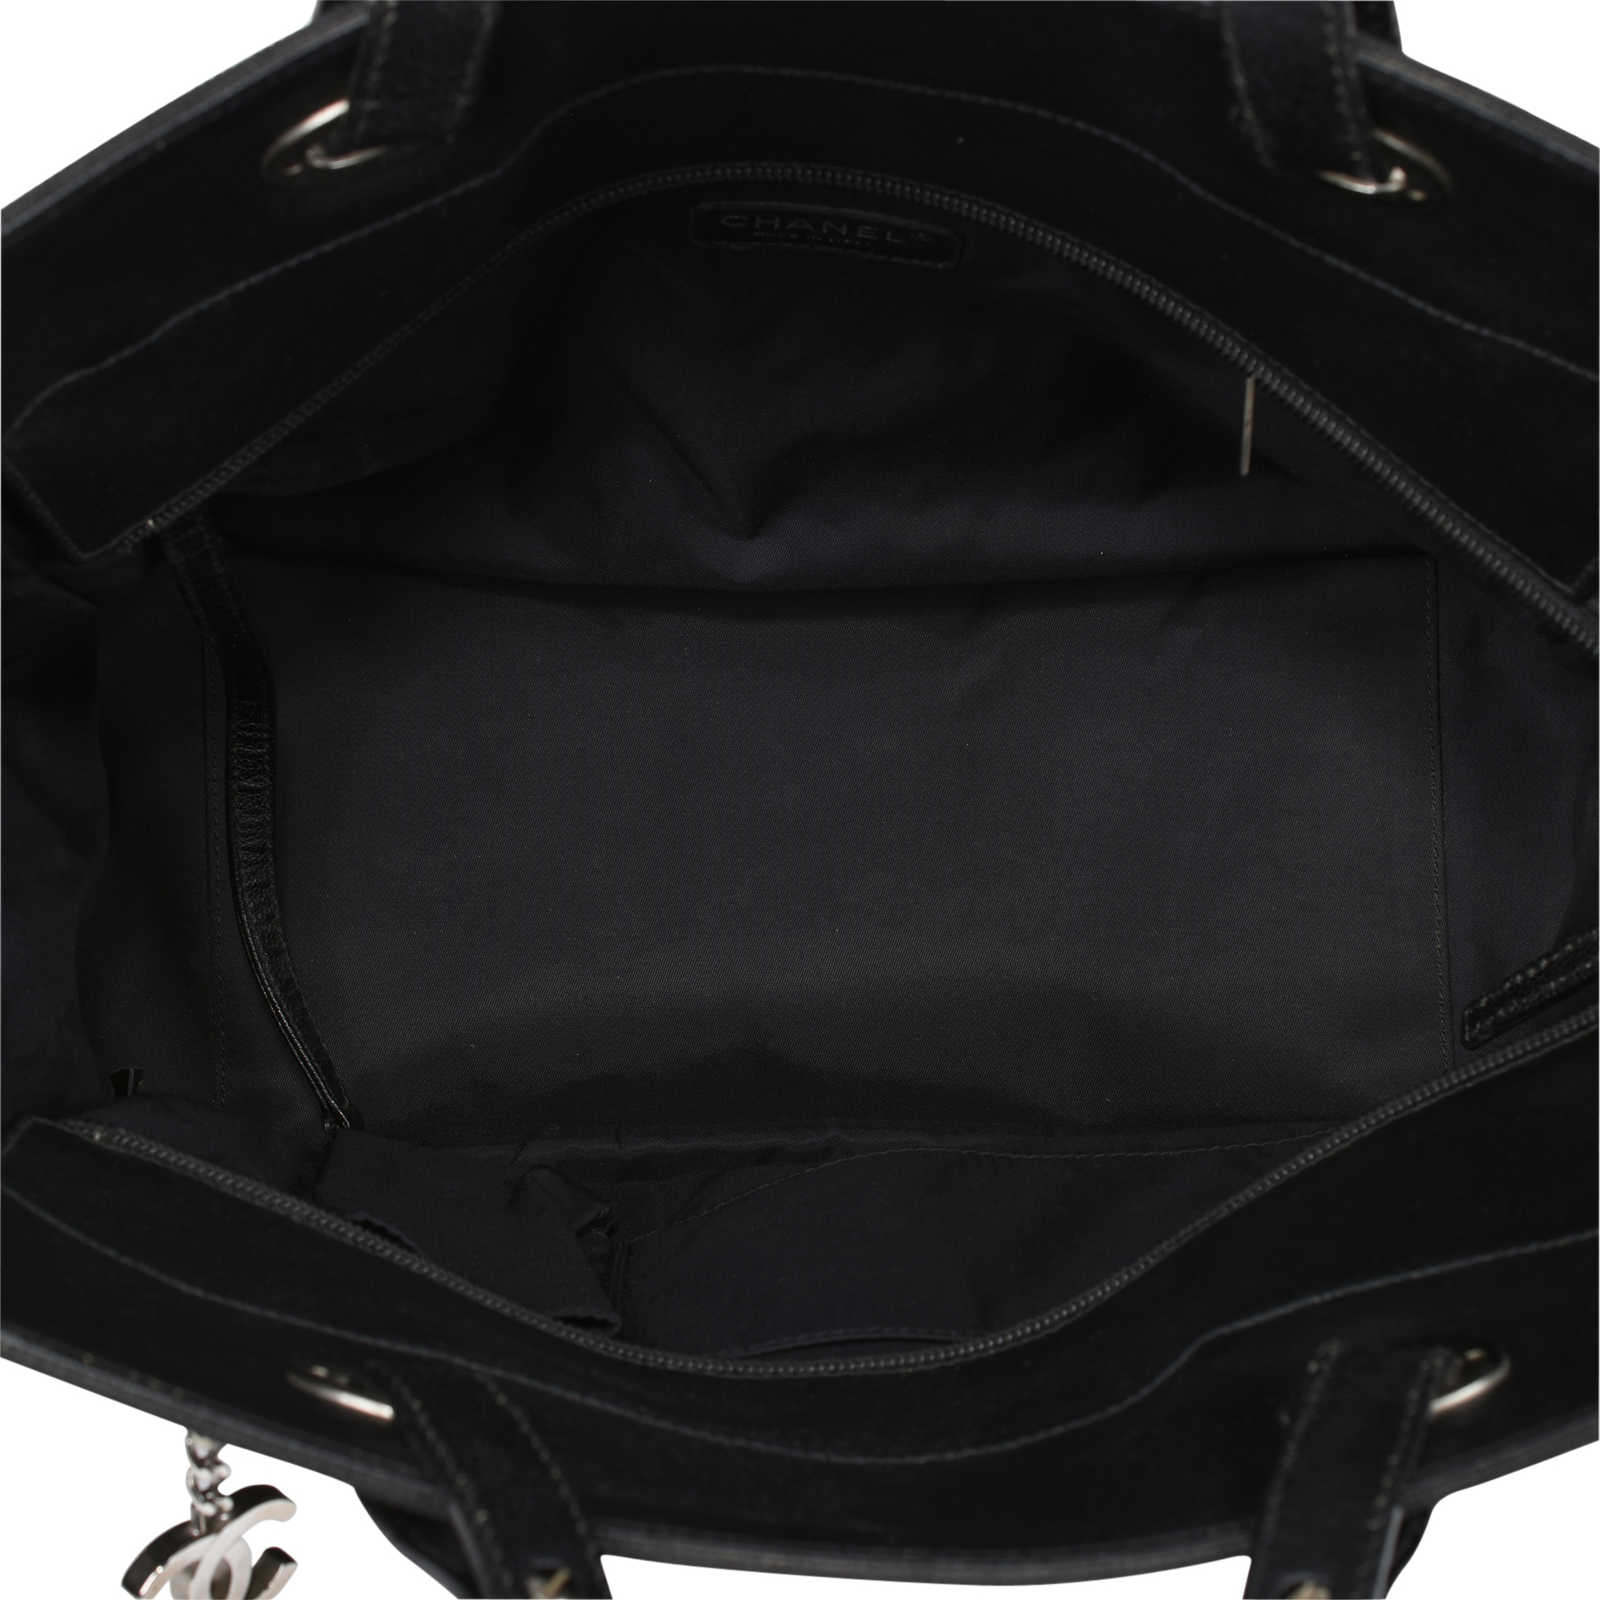 8fab8e874abc ... Authentic Second Hand Chanel Paris Biarritz Tote Bag (PSS-523-00002) ...